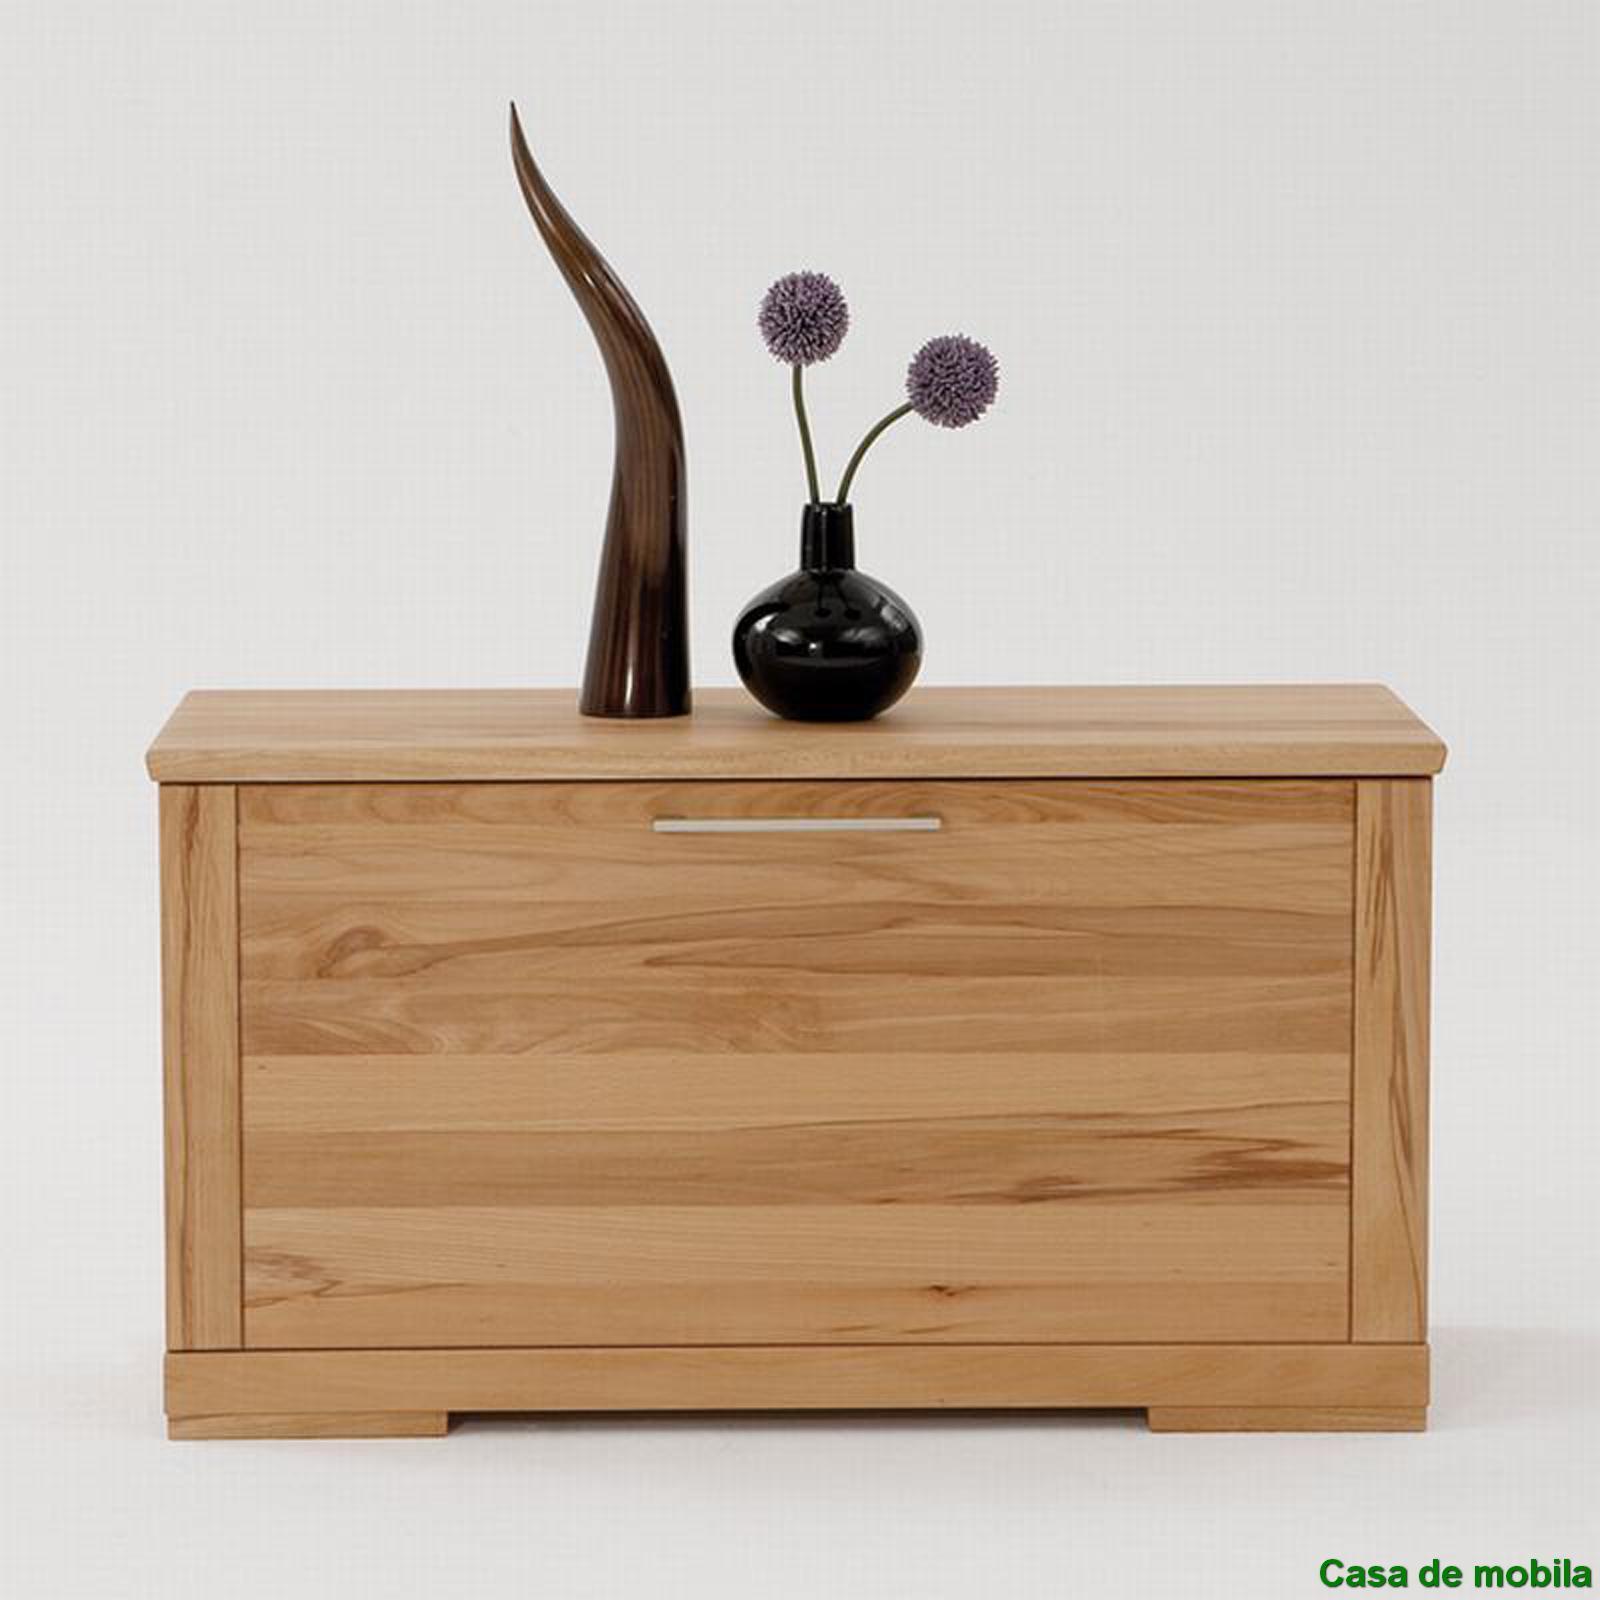 sitzbank buche free sitzbank buche with sitzbank buche dico massivholz beistell sitzbank ba. Black Bedroom Furniture Sets. Home Design Ideas